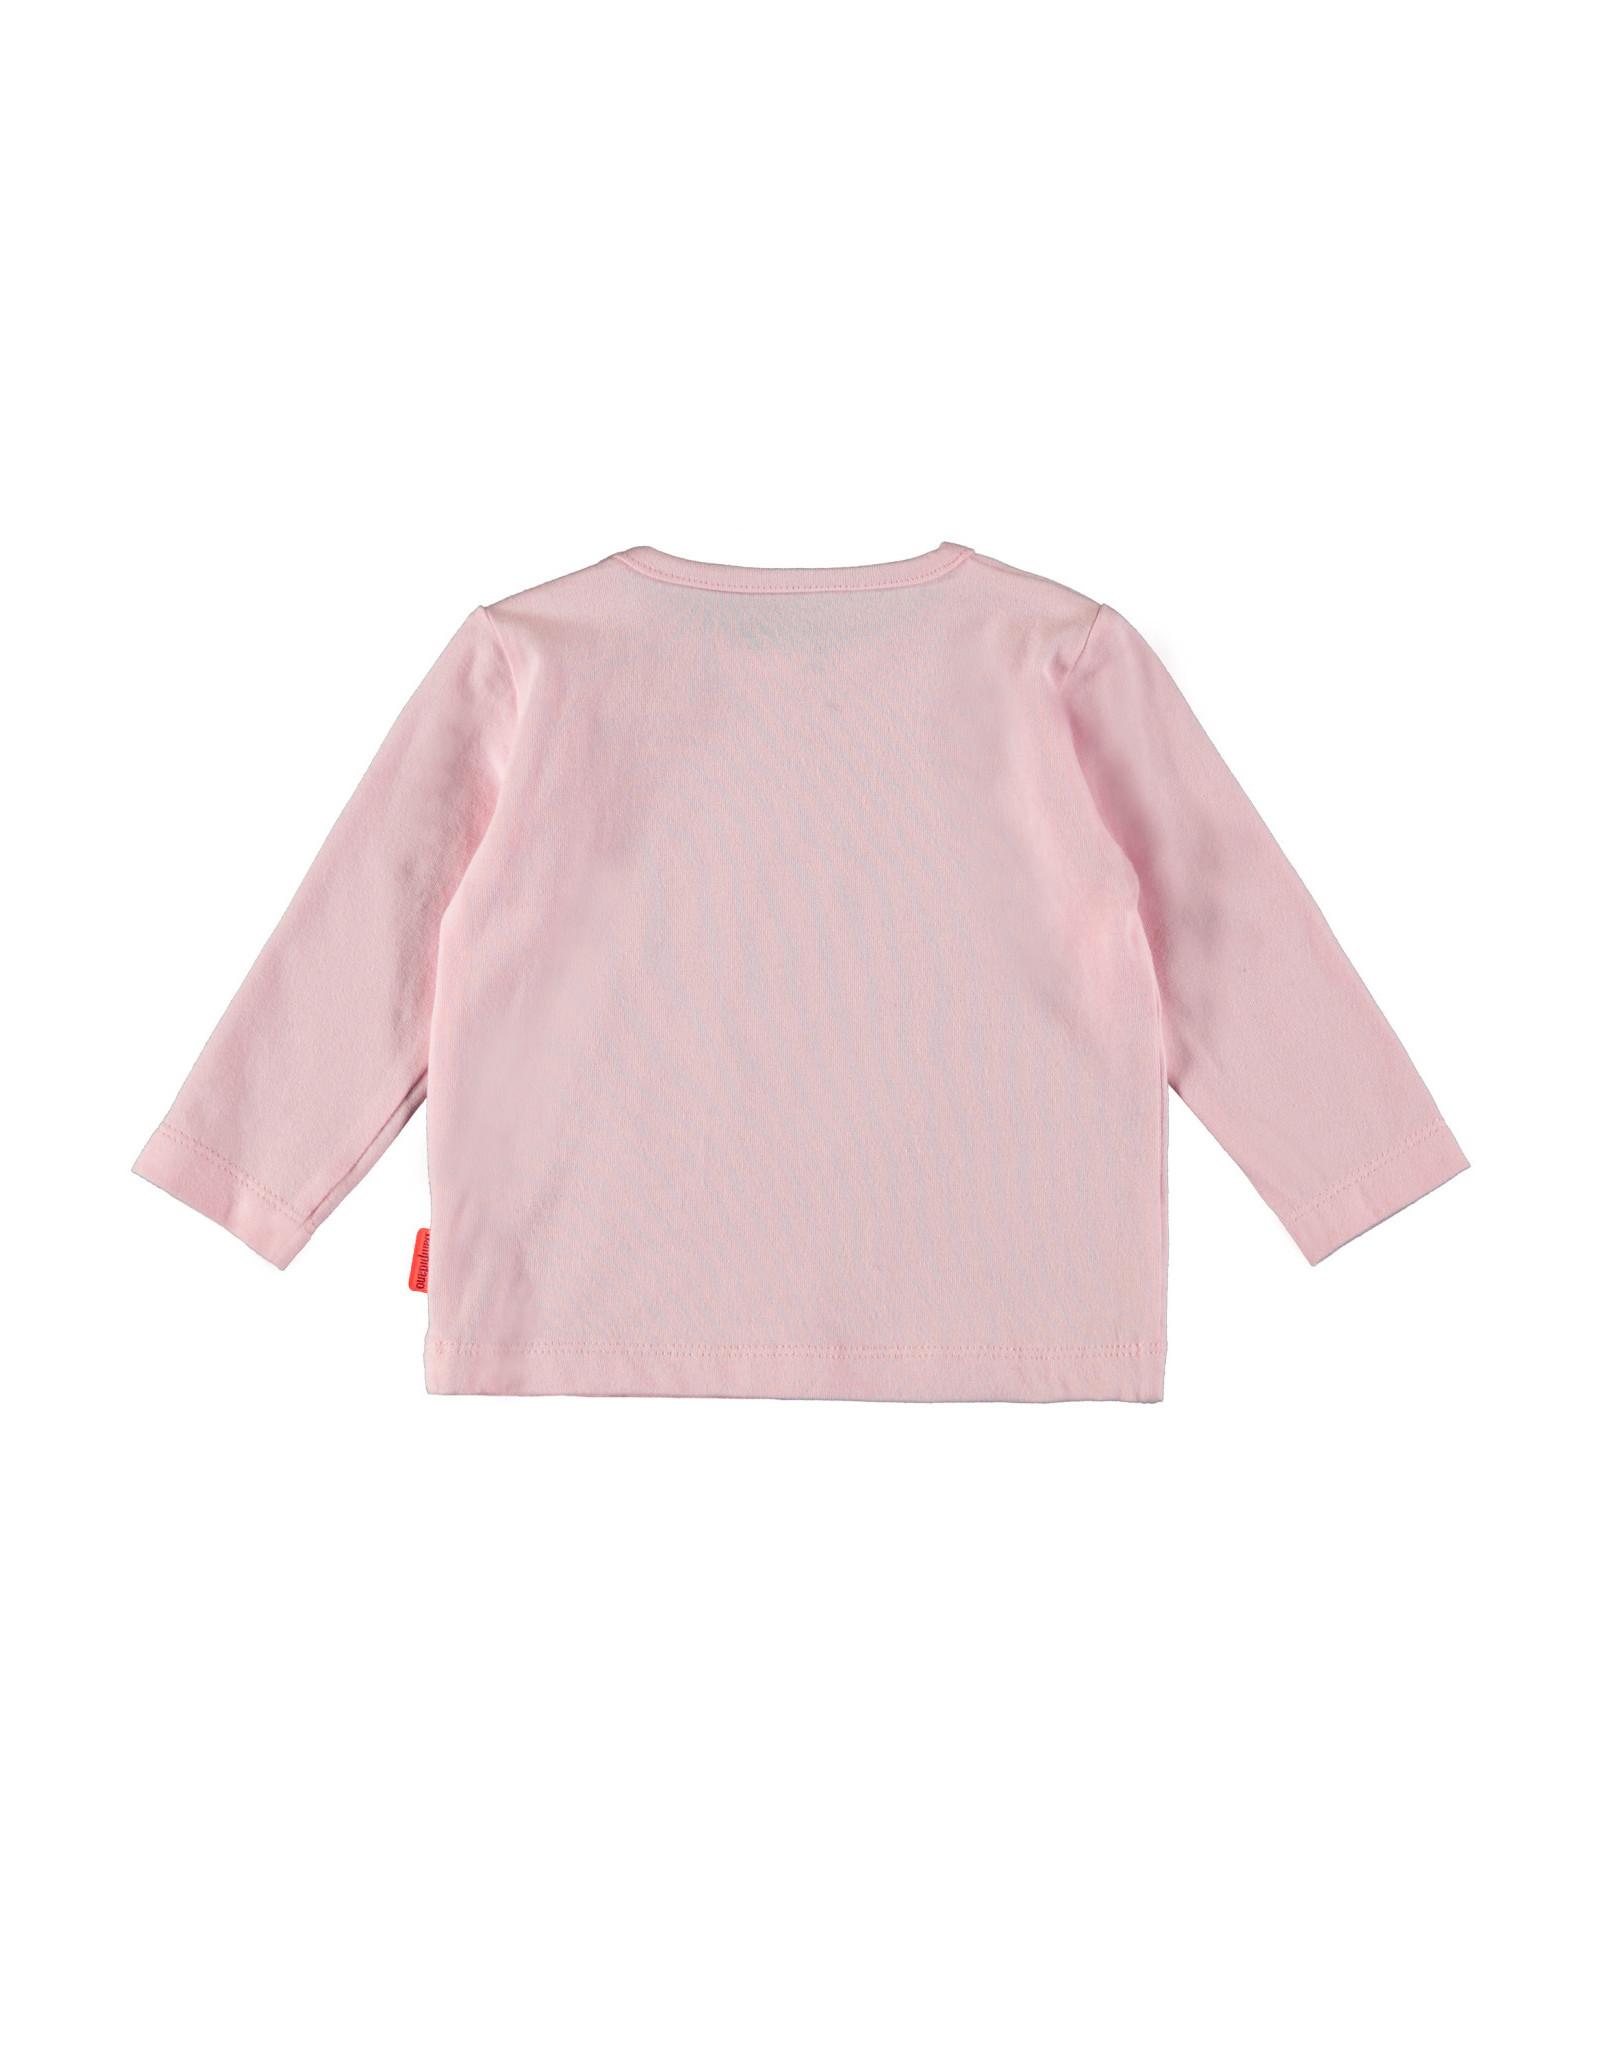 Bampidano Bampidano newborn meisjes shirt Dewi Light Pink